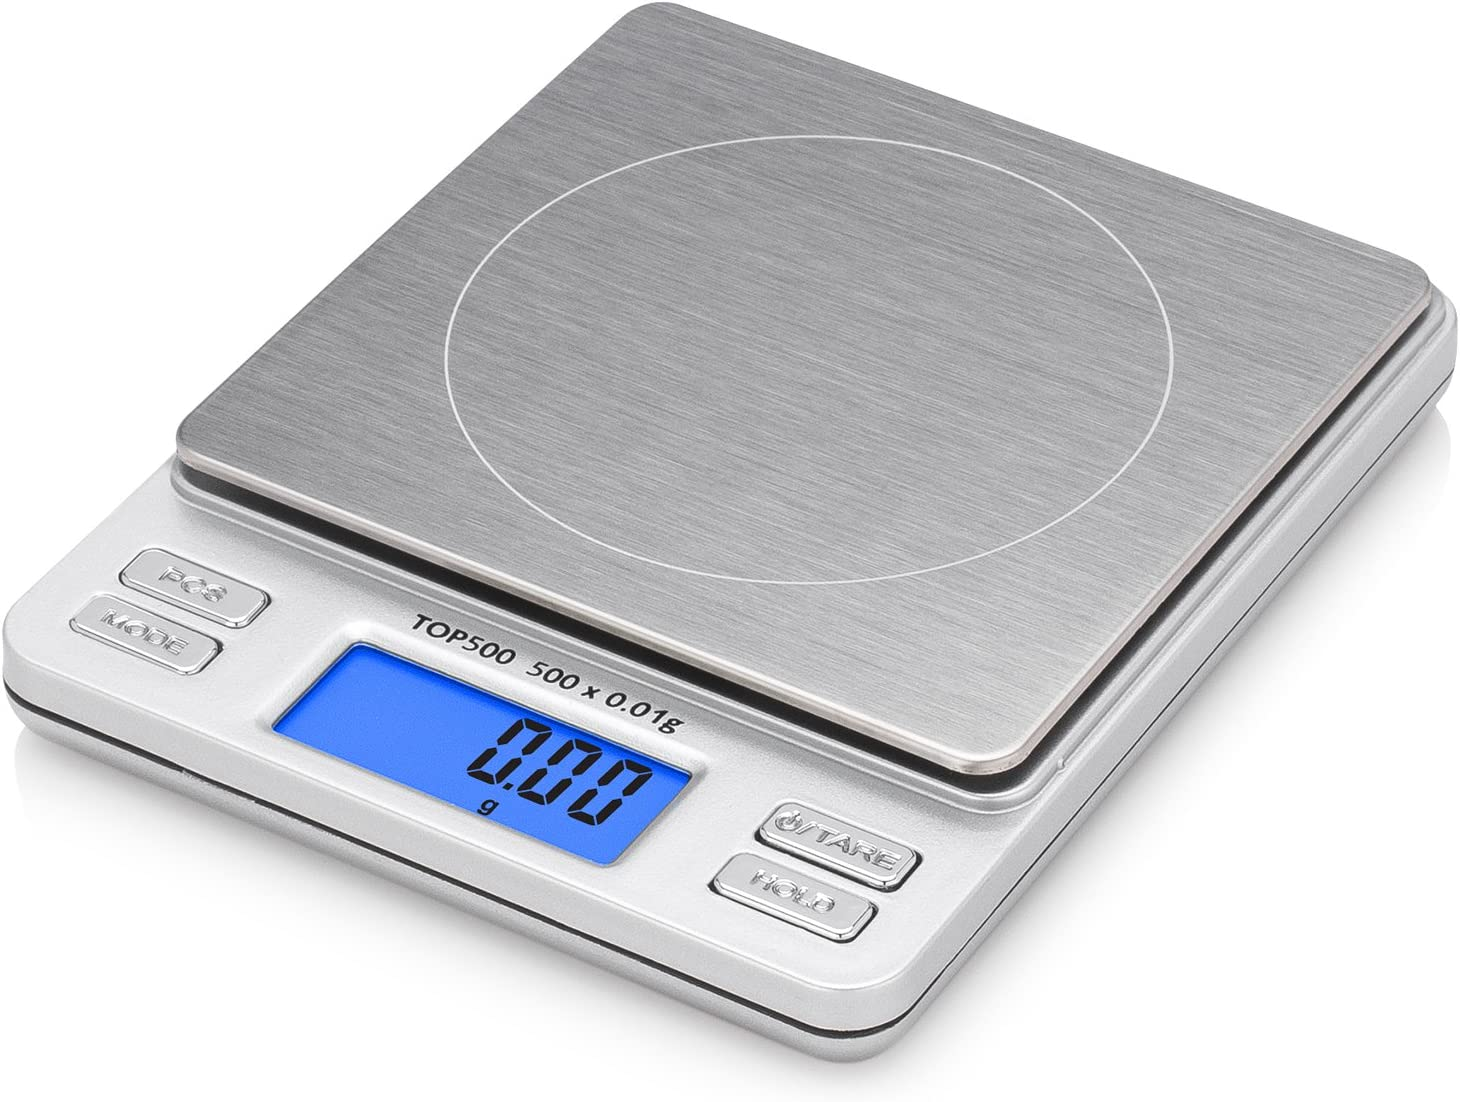 Mini LCD Display Electronic Kitchen Scale Food Balance Auto-on//off Sale UK SHIP